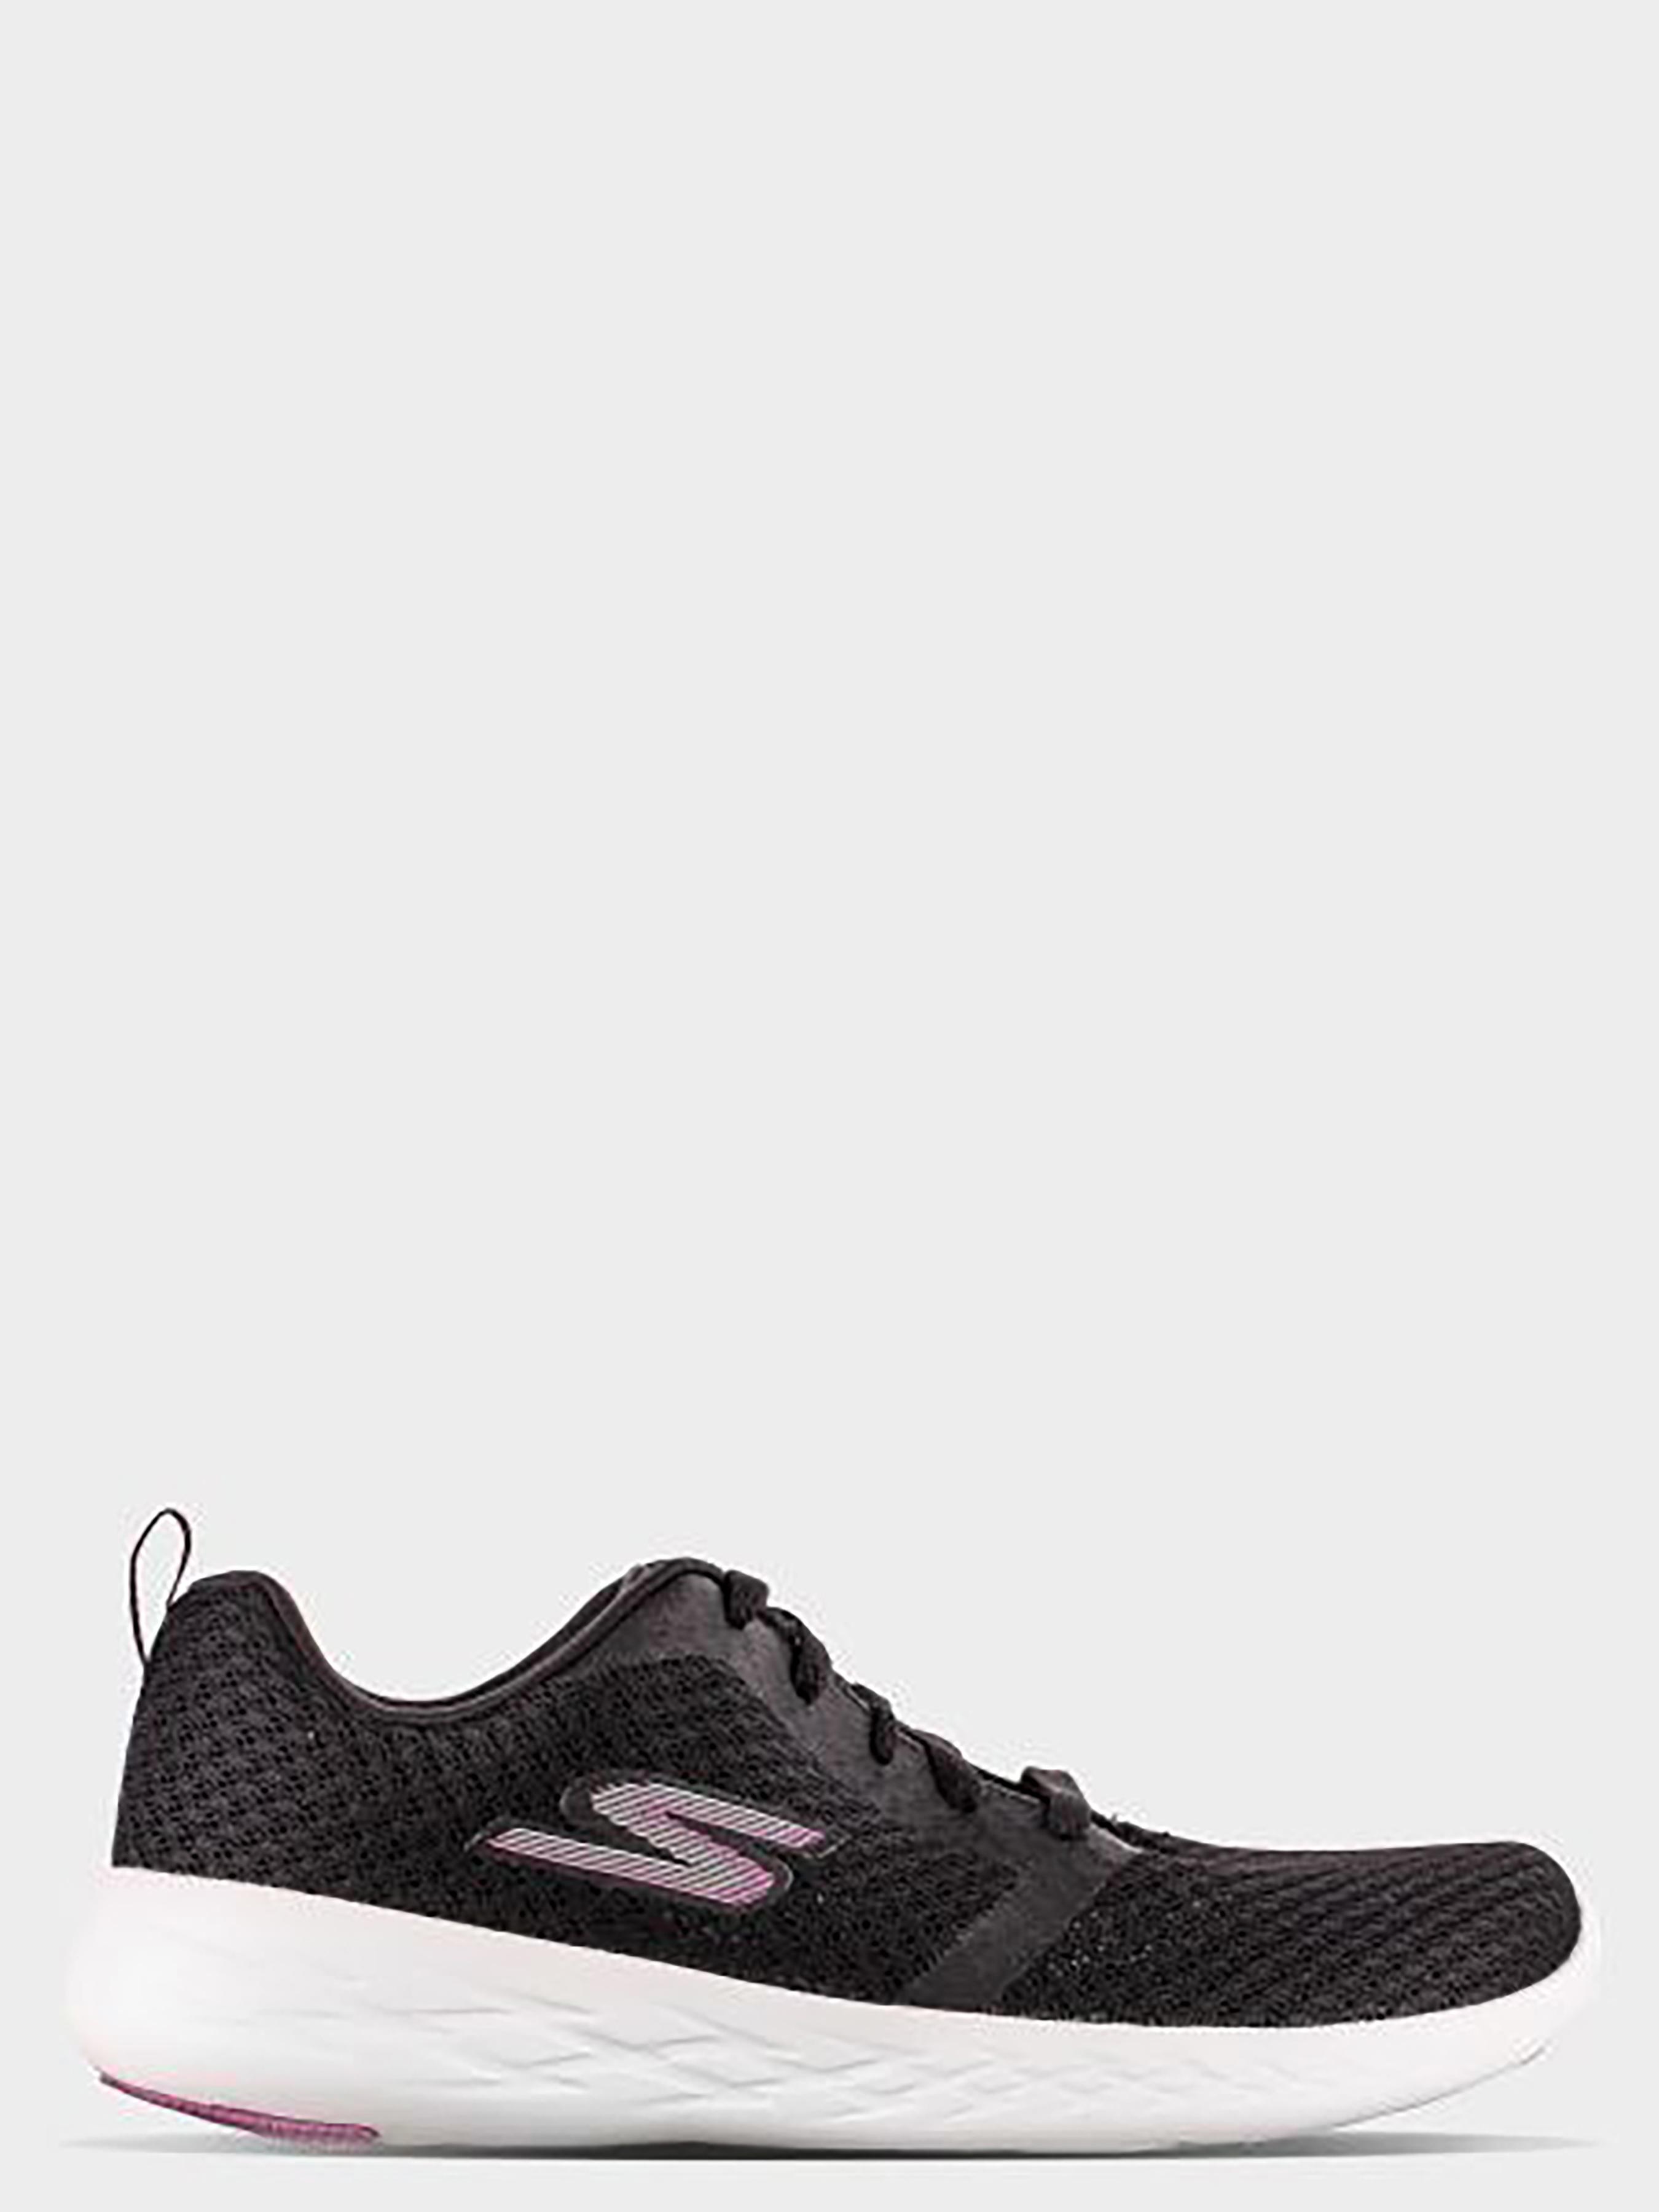 Кроссовки для женщин Skechers KW4875 продажа, 2017